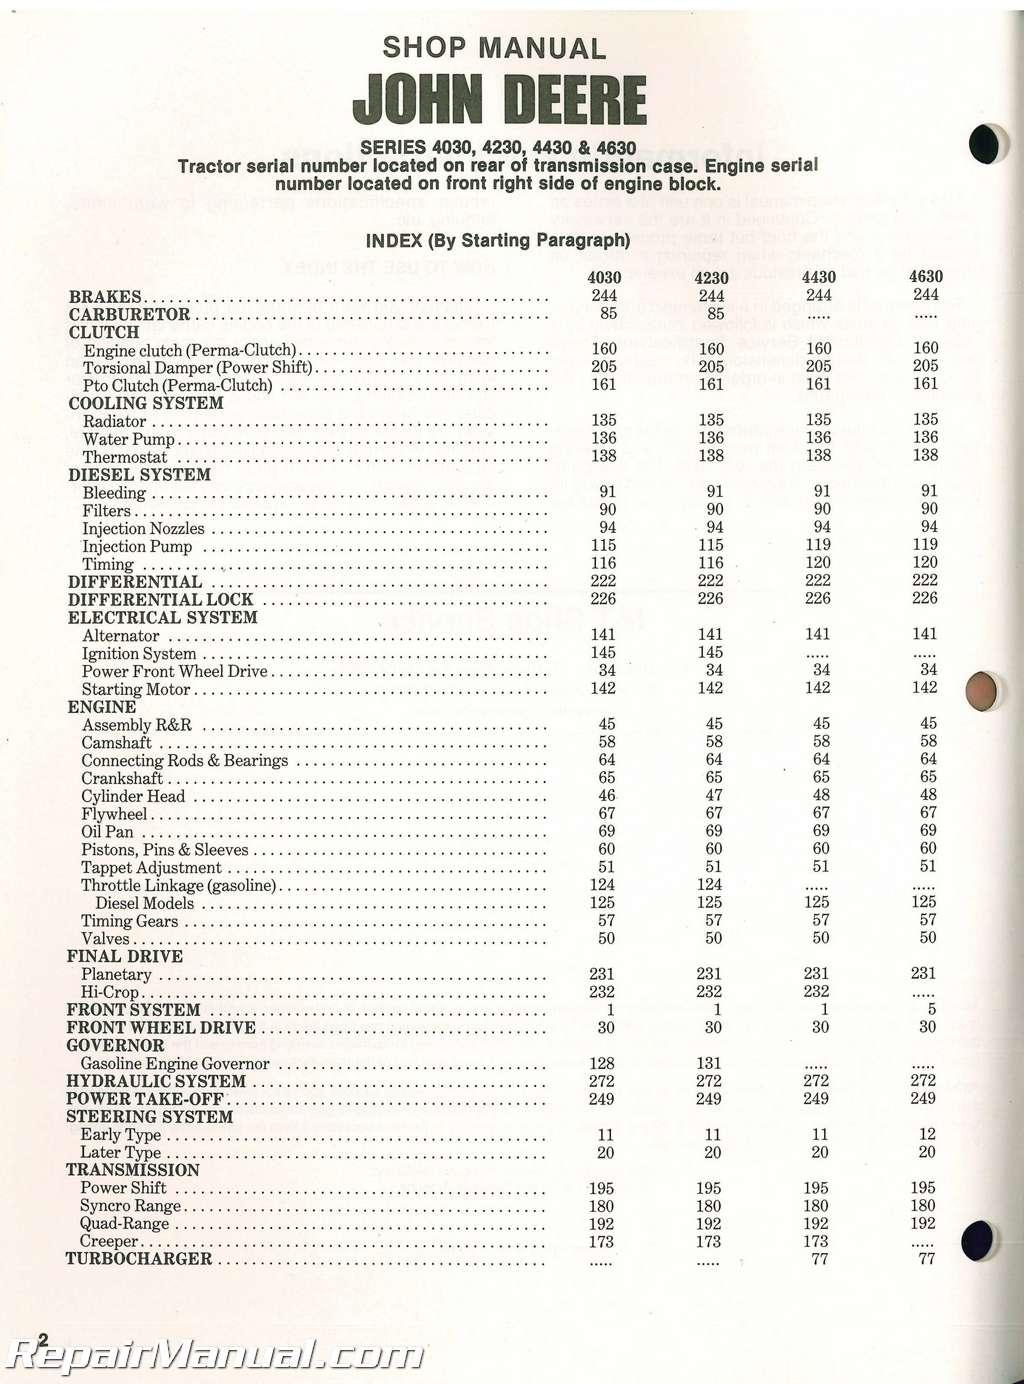 John Deere 4030 4230 4430 4630 Tractor Workshop Manual_003 john deere 4430 wiring diagram,John Deere 4430 Wiring Diagram For Starter